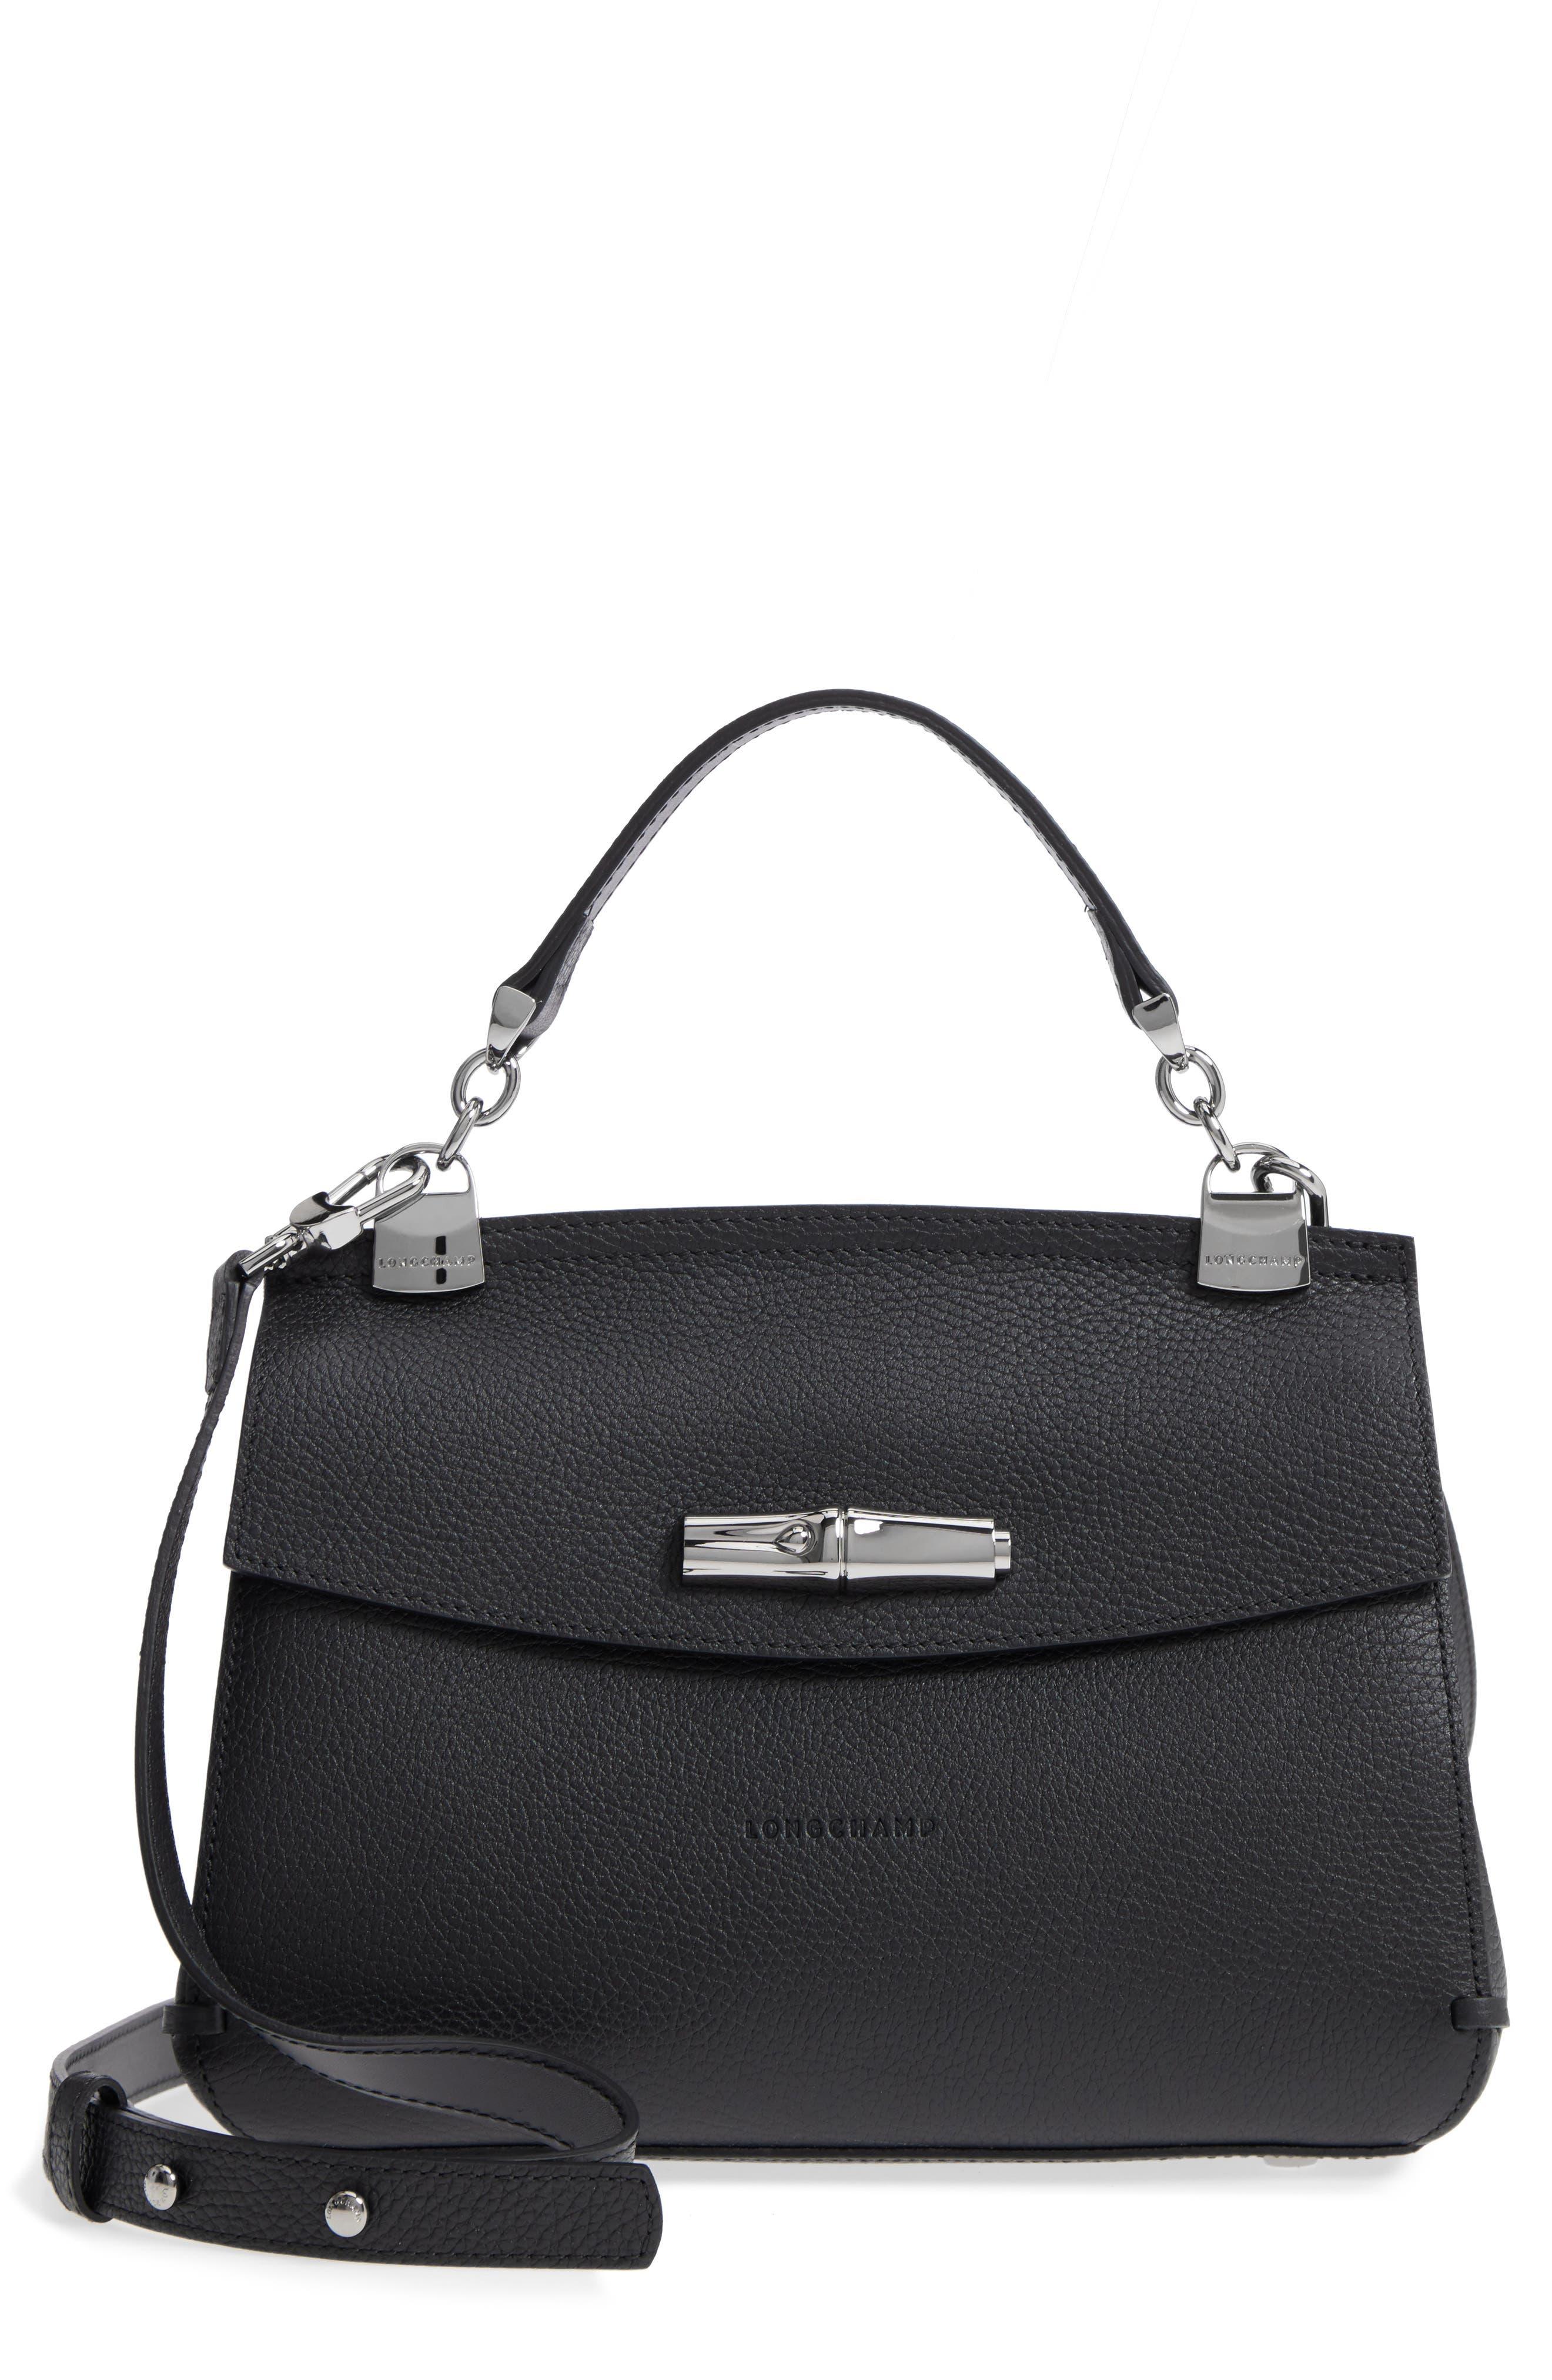 Longchamp Madeleine Leather Satchel